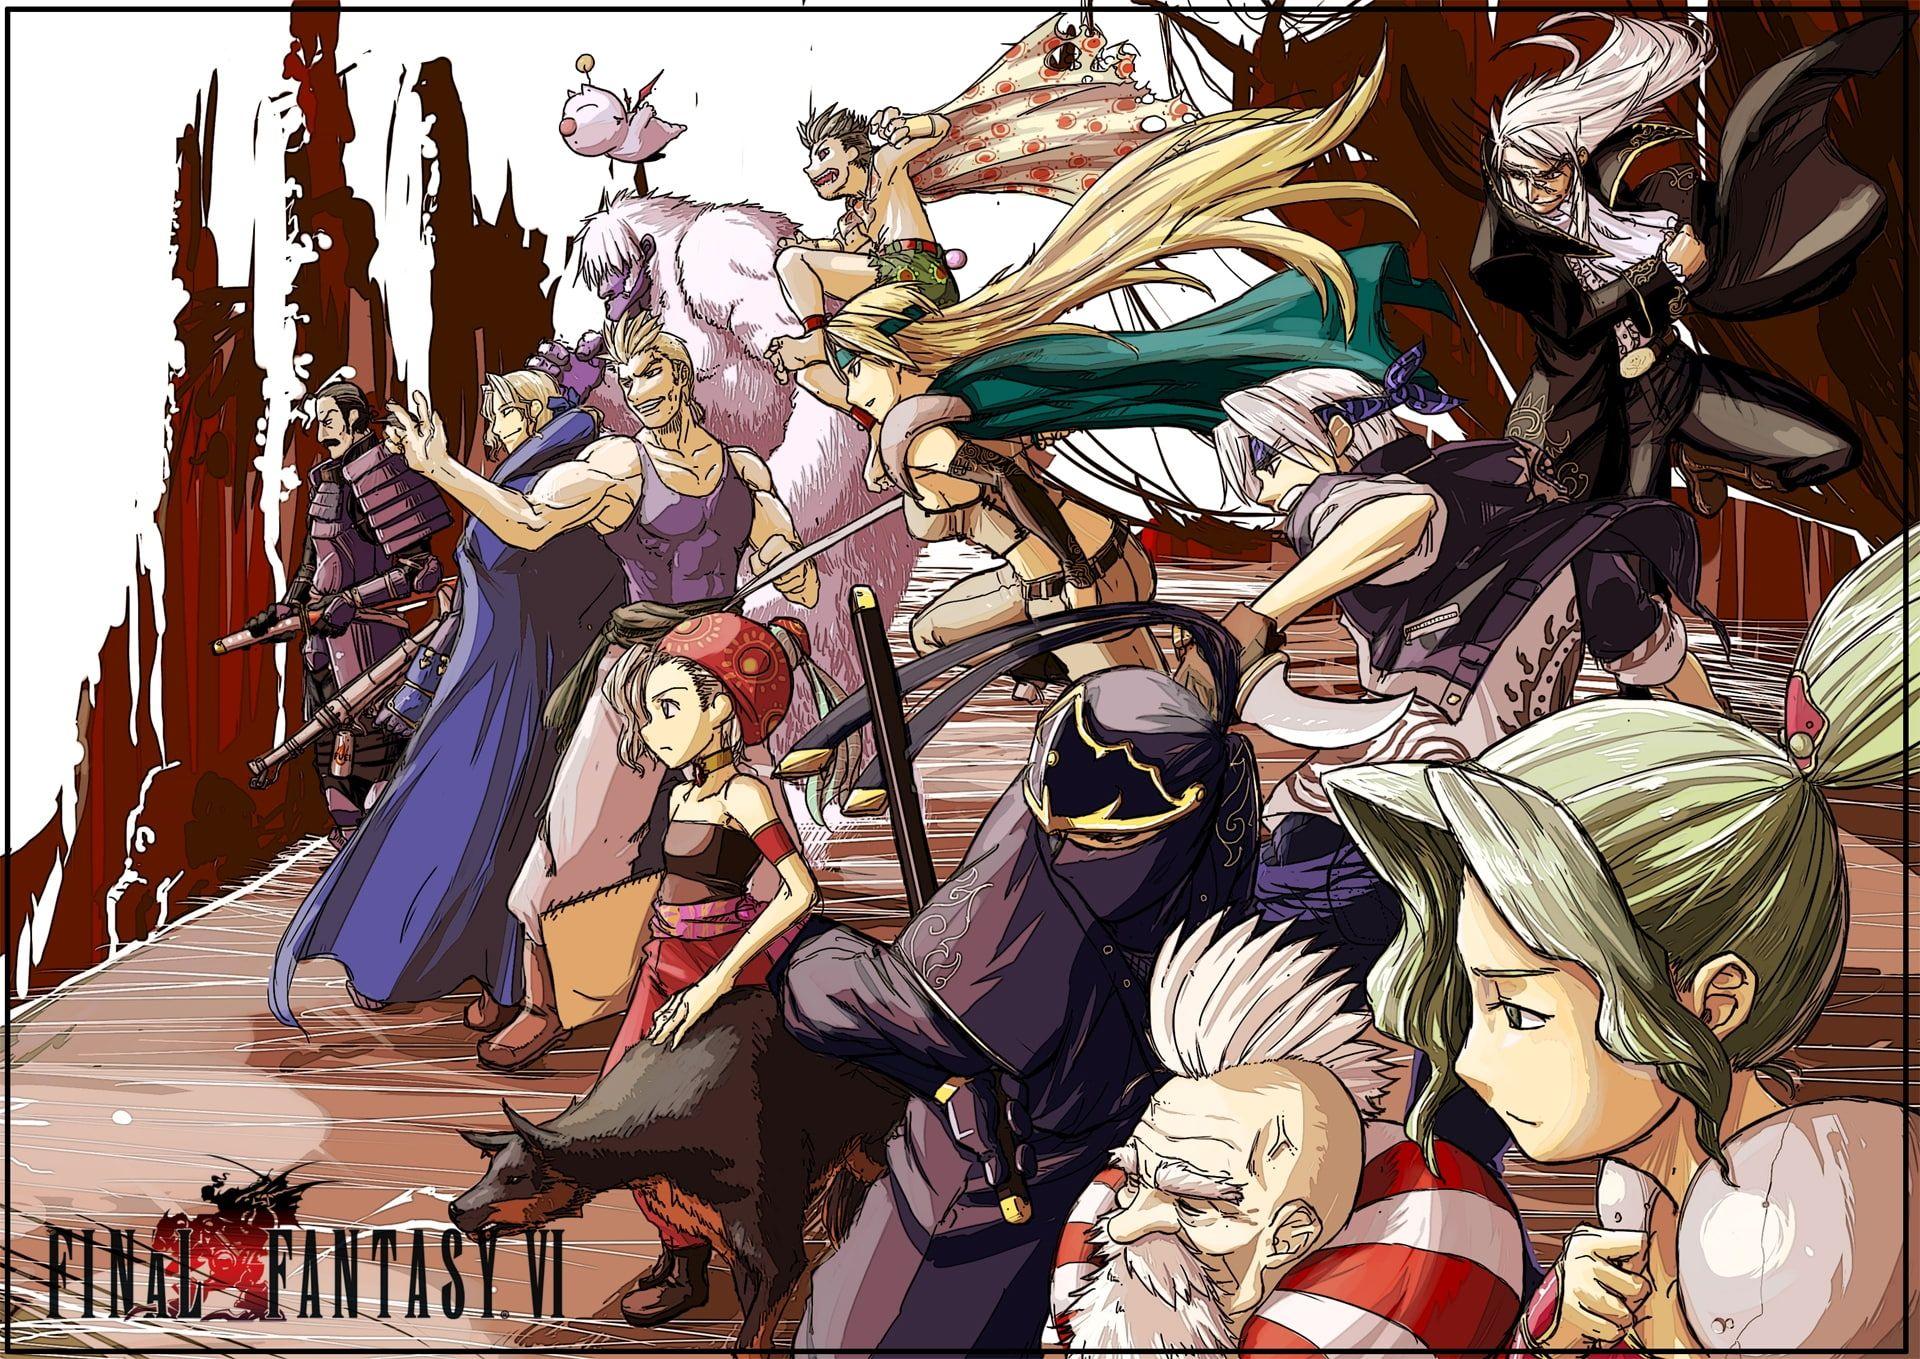 Final Fantasy Vi Video Games Final Fantasy Hd Art Final Fantasy Vi 1080p Wallpaper Hdwallpaper Desktop In 2020 Final Fantasy Vi Final Fantasy Art Fantasy Games